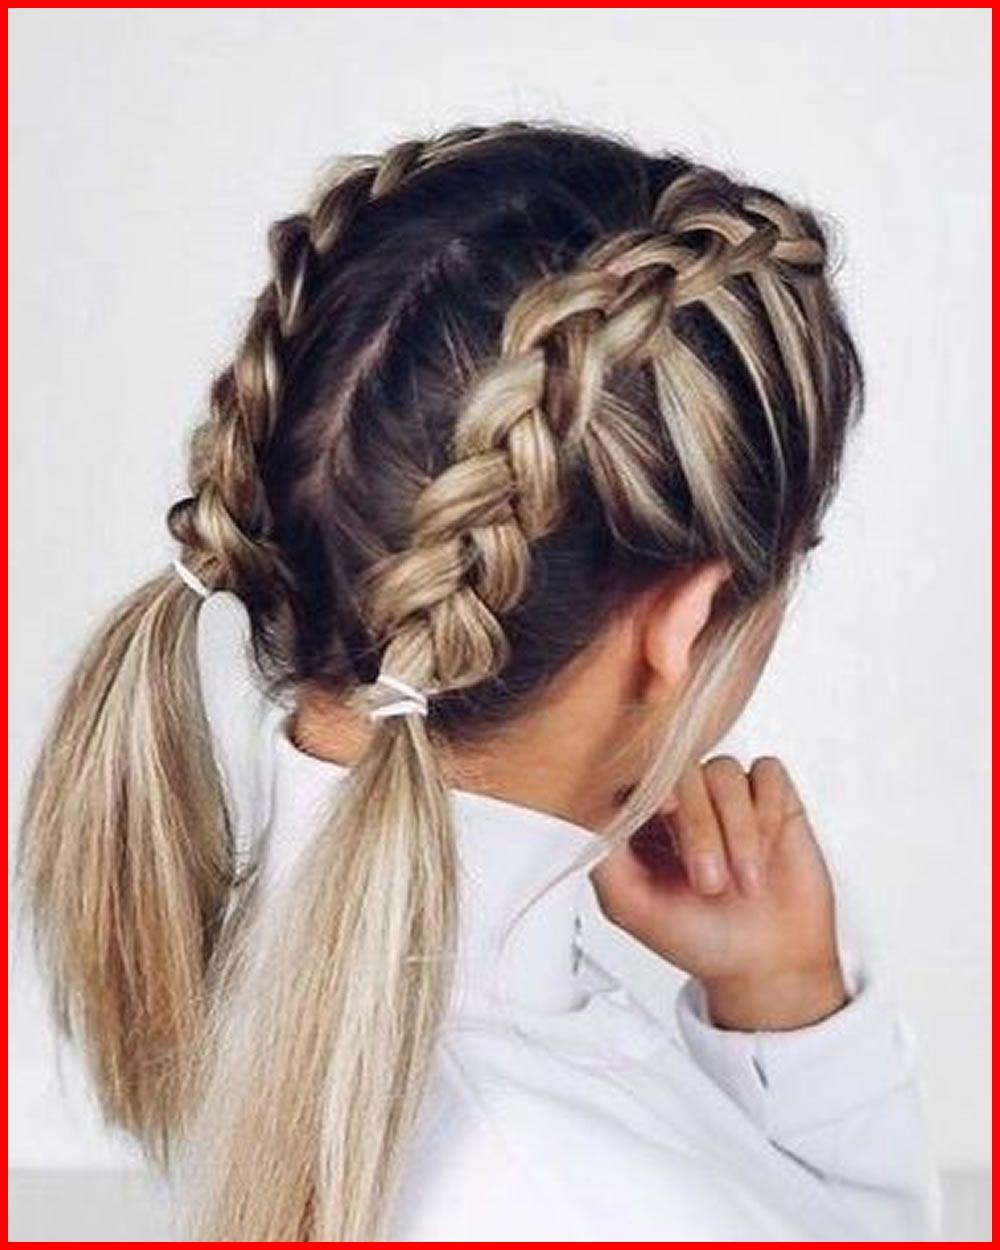 بالصور تسريحات شعر مدرسية , صور تسريحات شعر بسيطه 2442 5